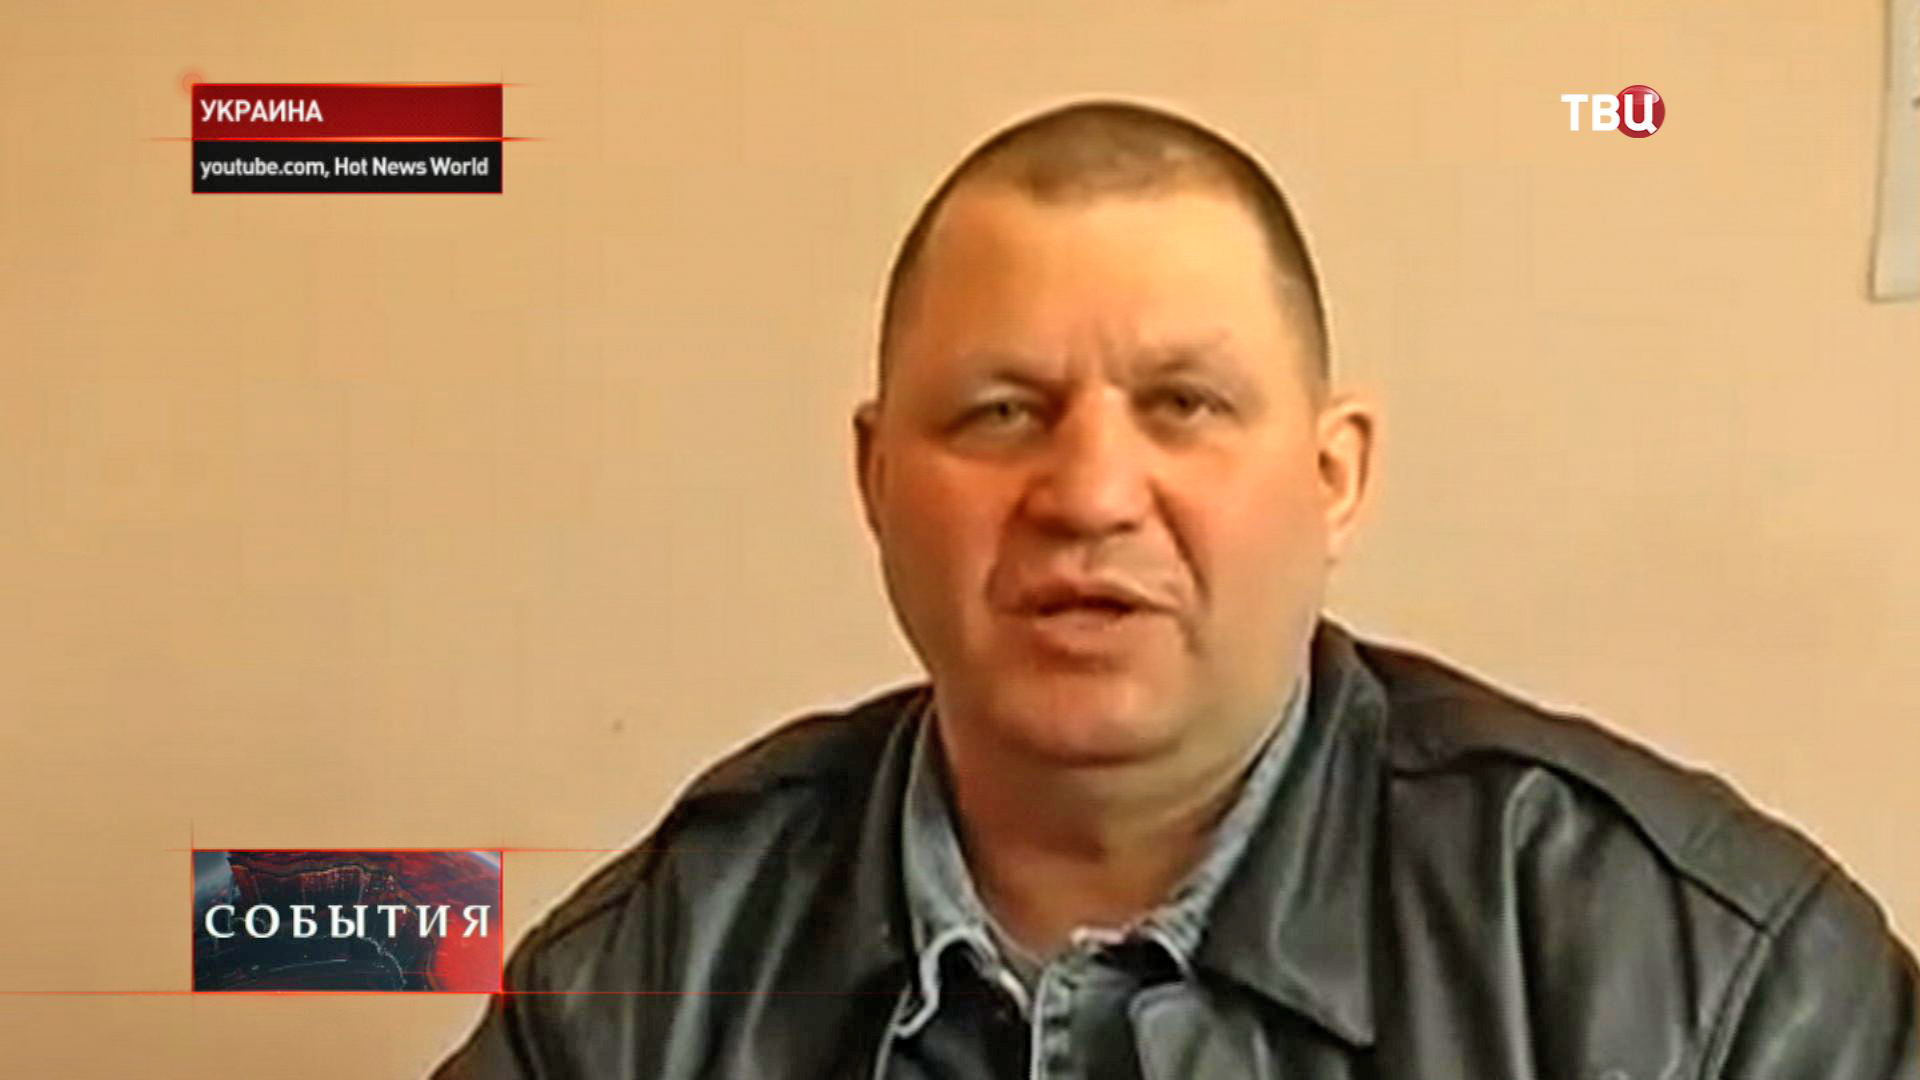 как убили сашу белого на украине видео